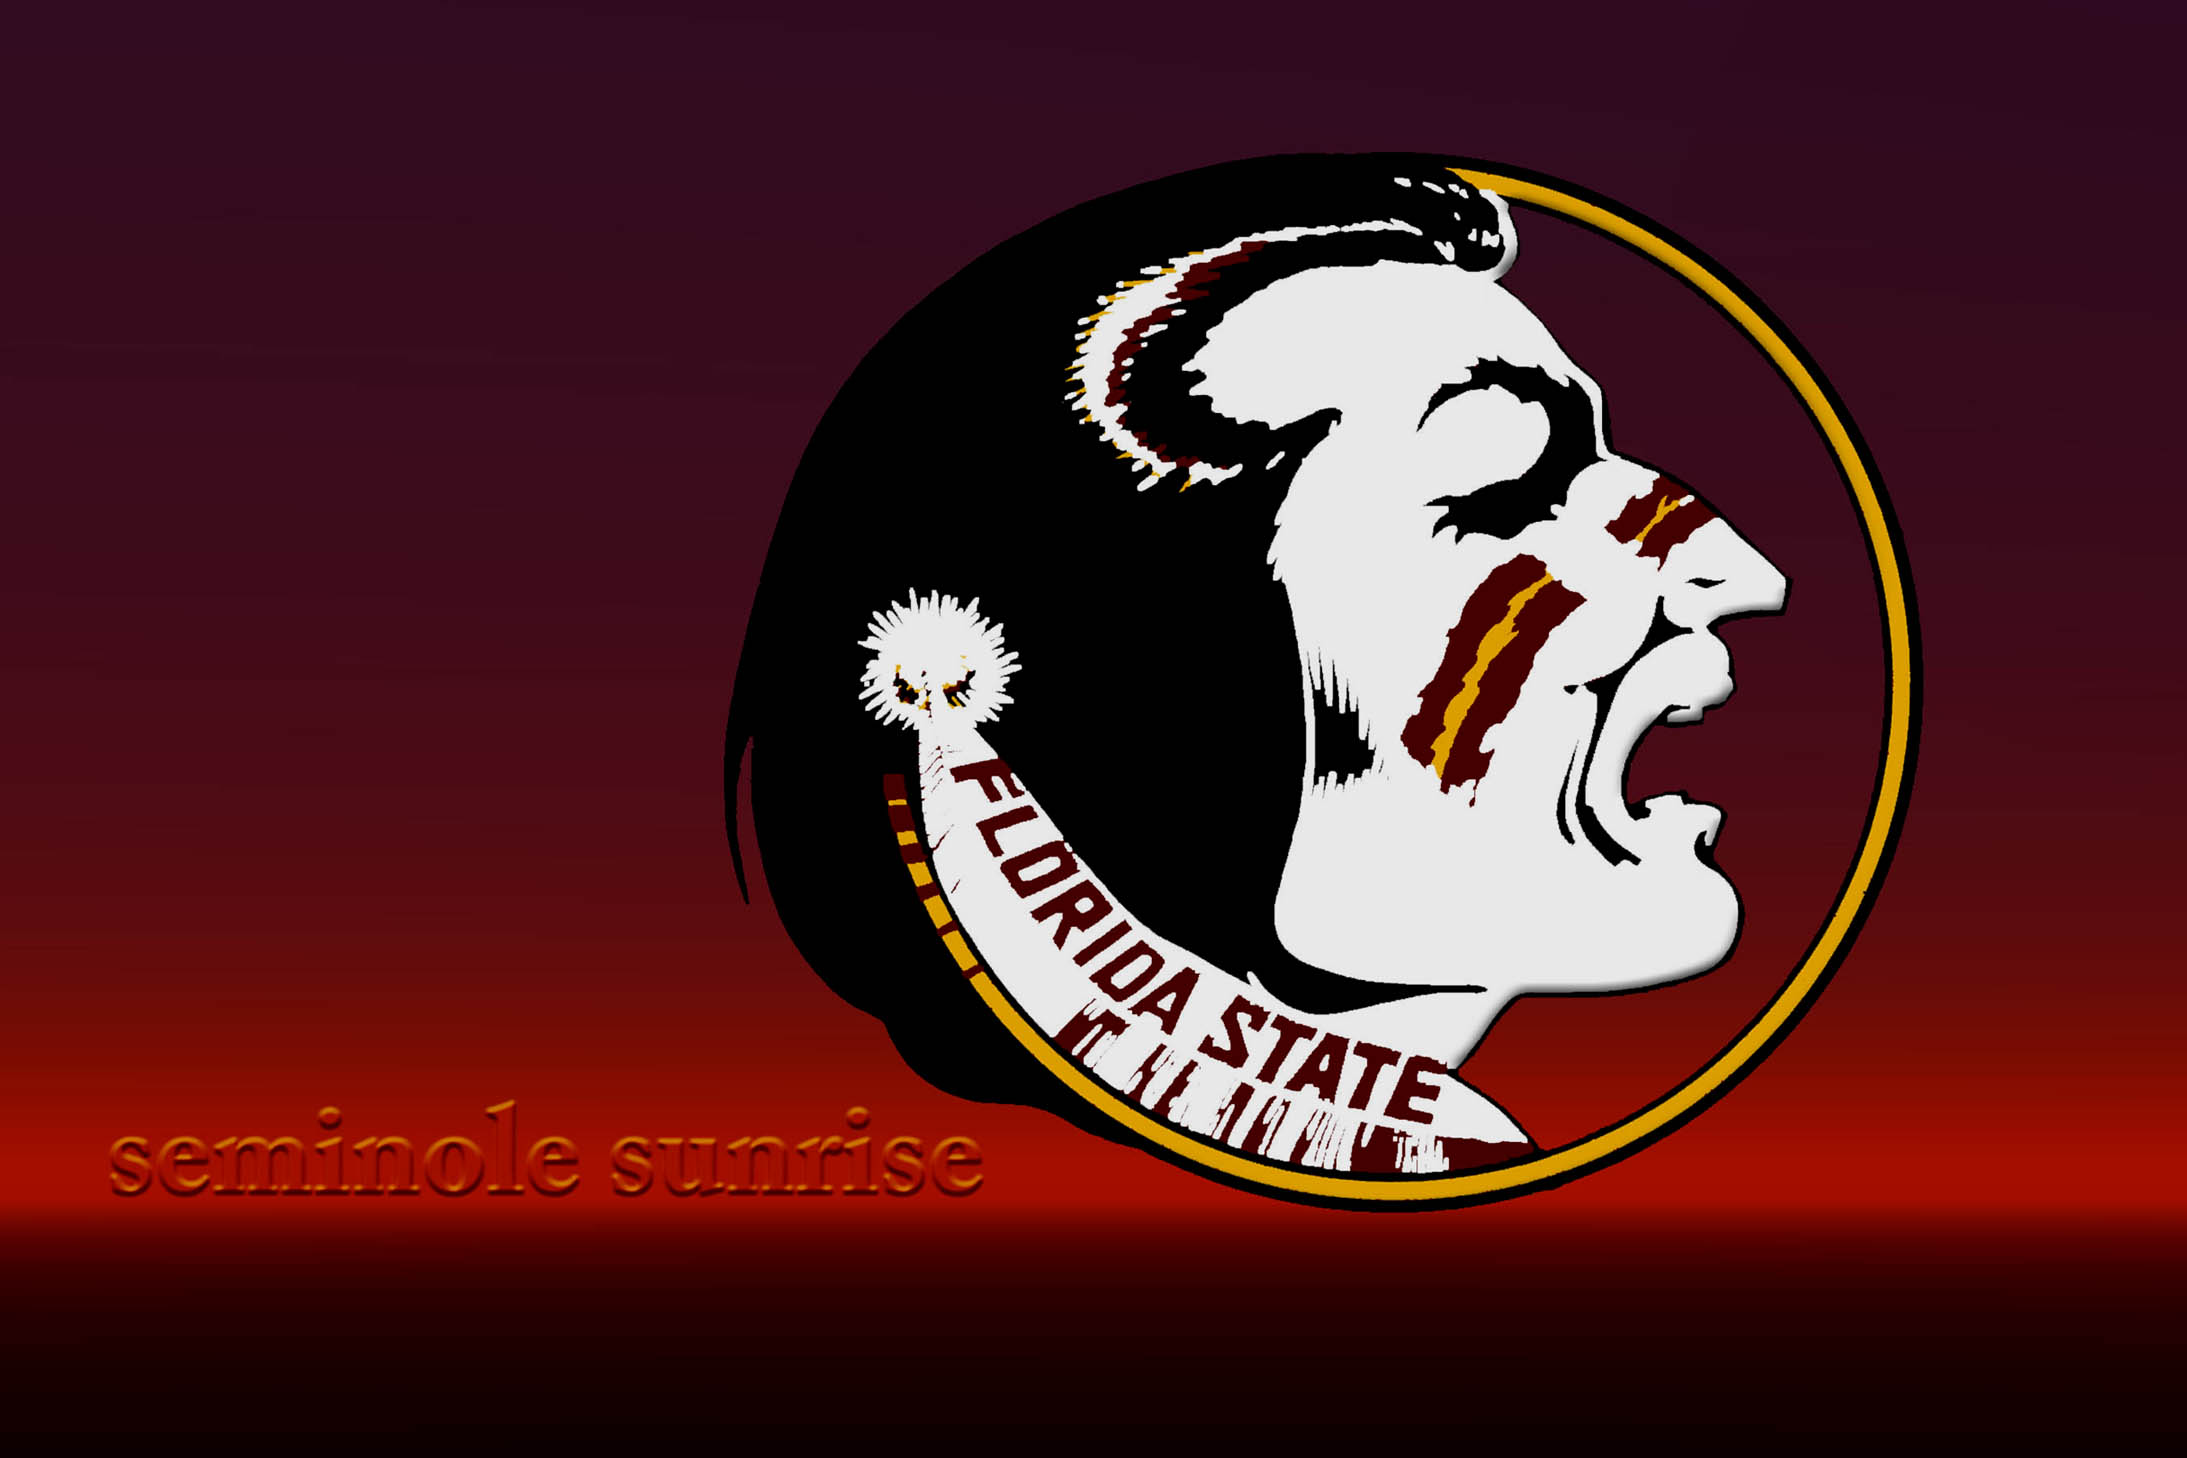 FORIDA STATE SEMINOLES college football 28 JPG wallpaper background 2187x1458